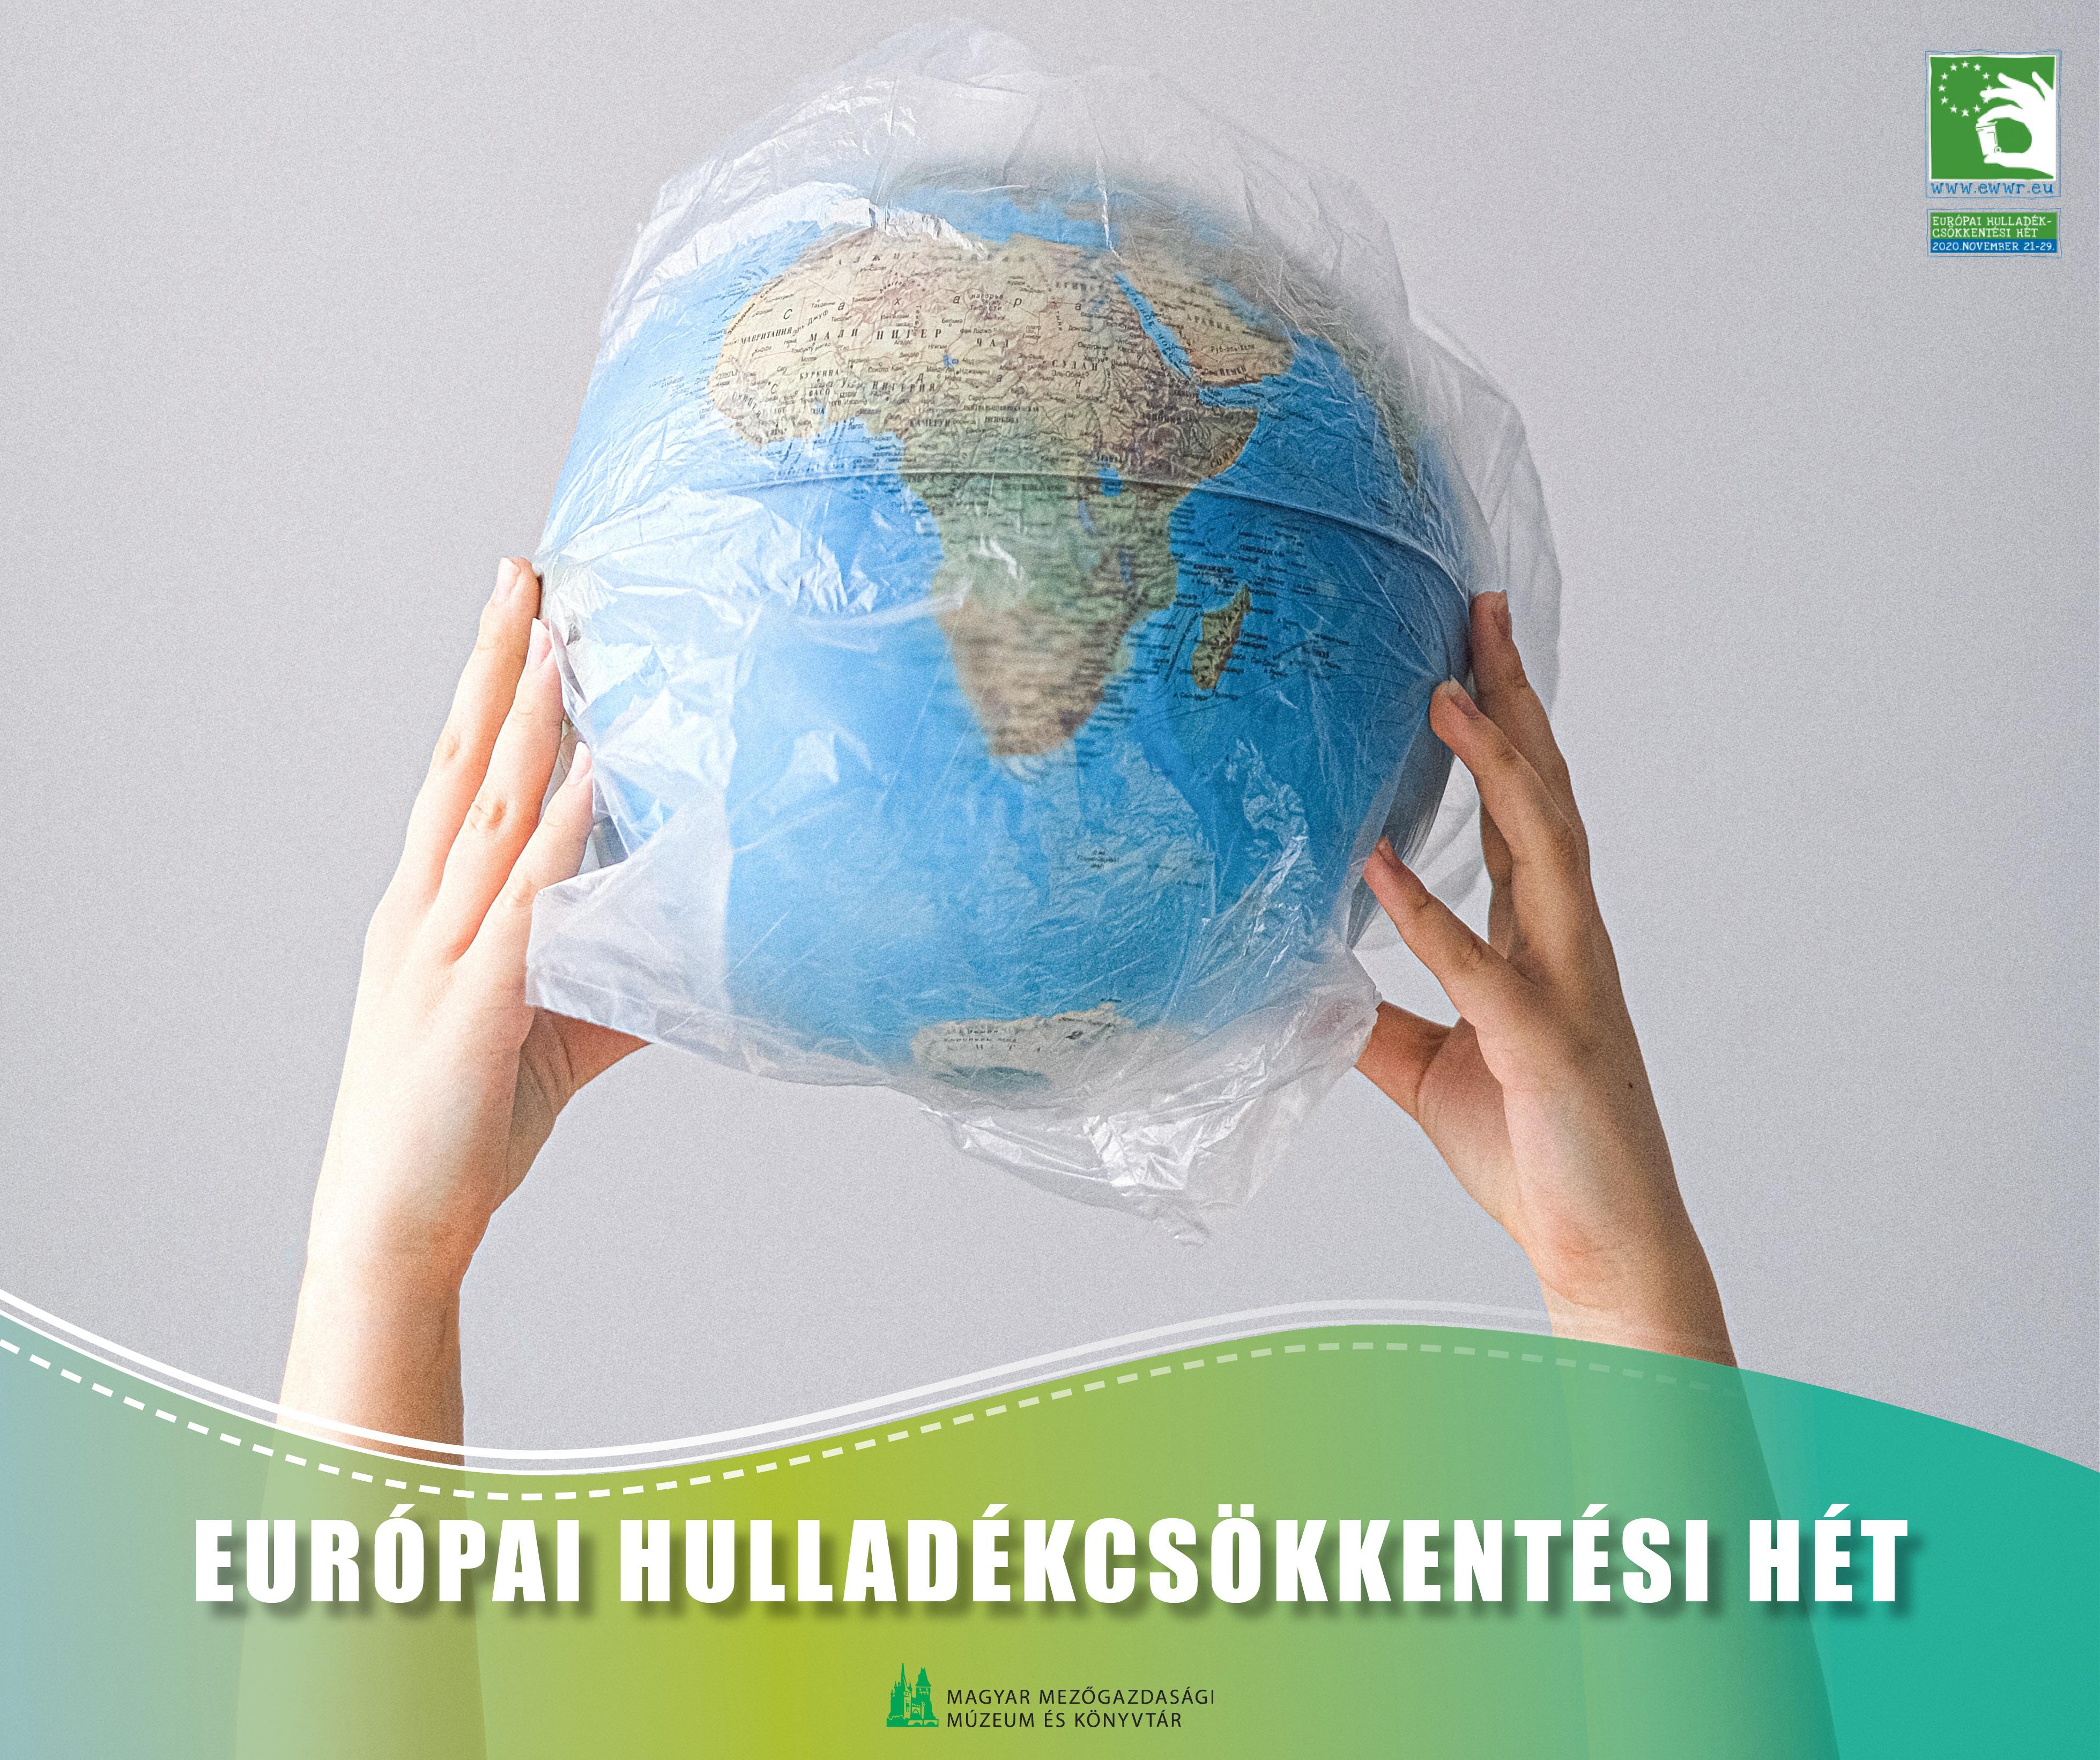 nyitokep_europai_hulladekmentes_het_940_788_20202.jpg